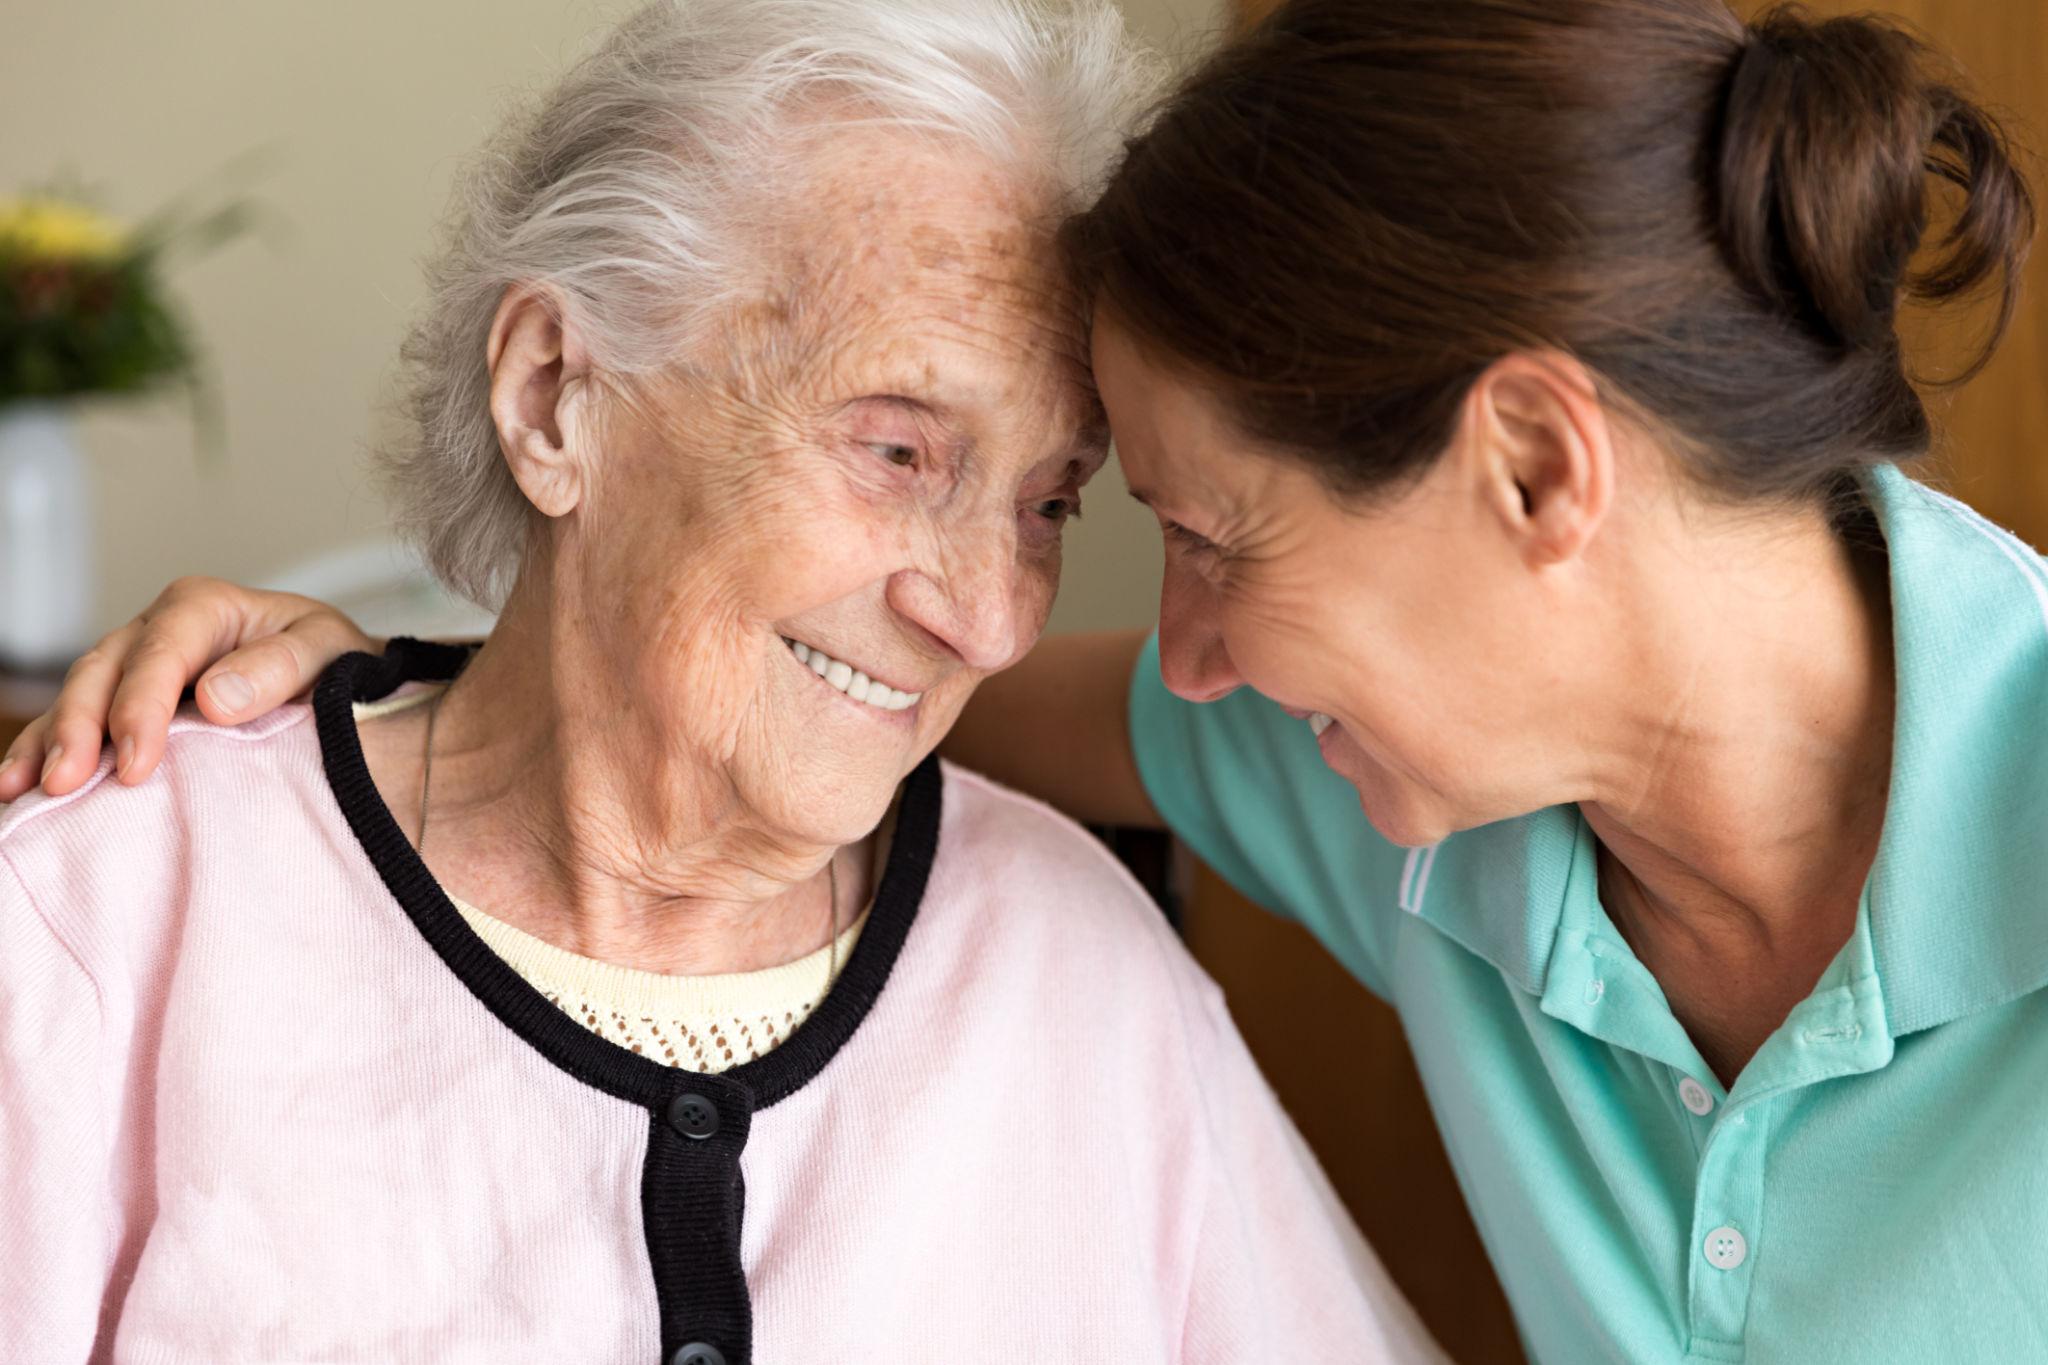 hospice criteria for dementia patients